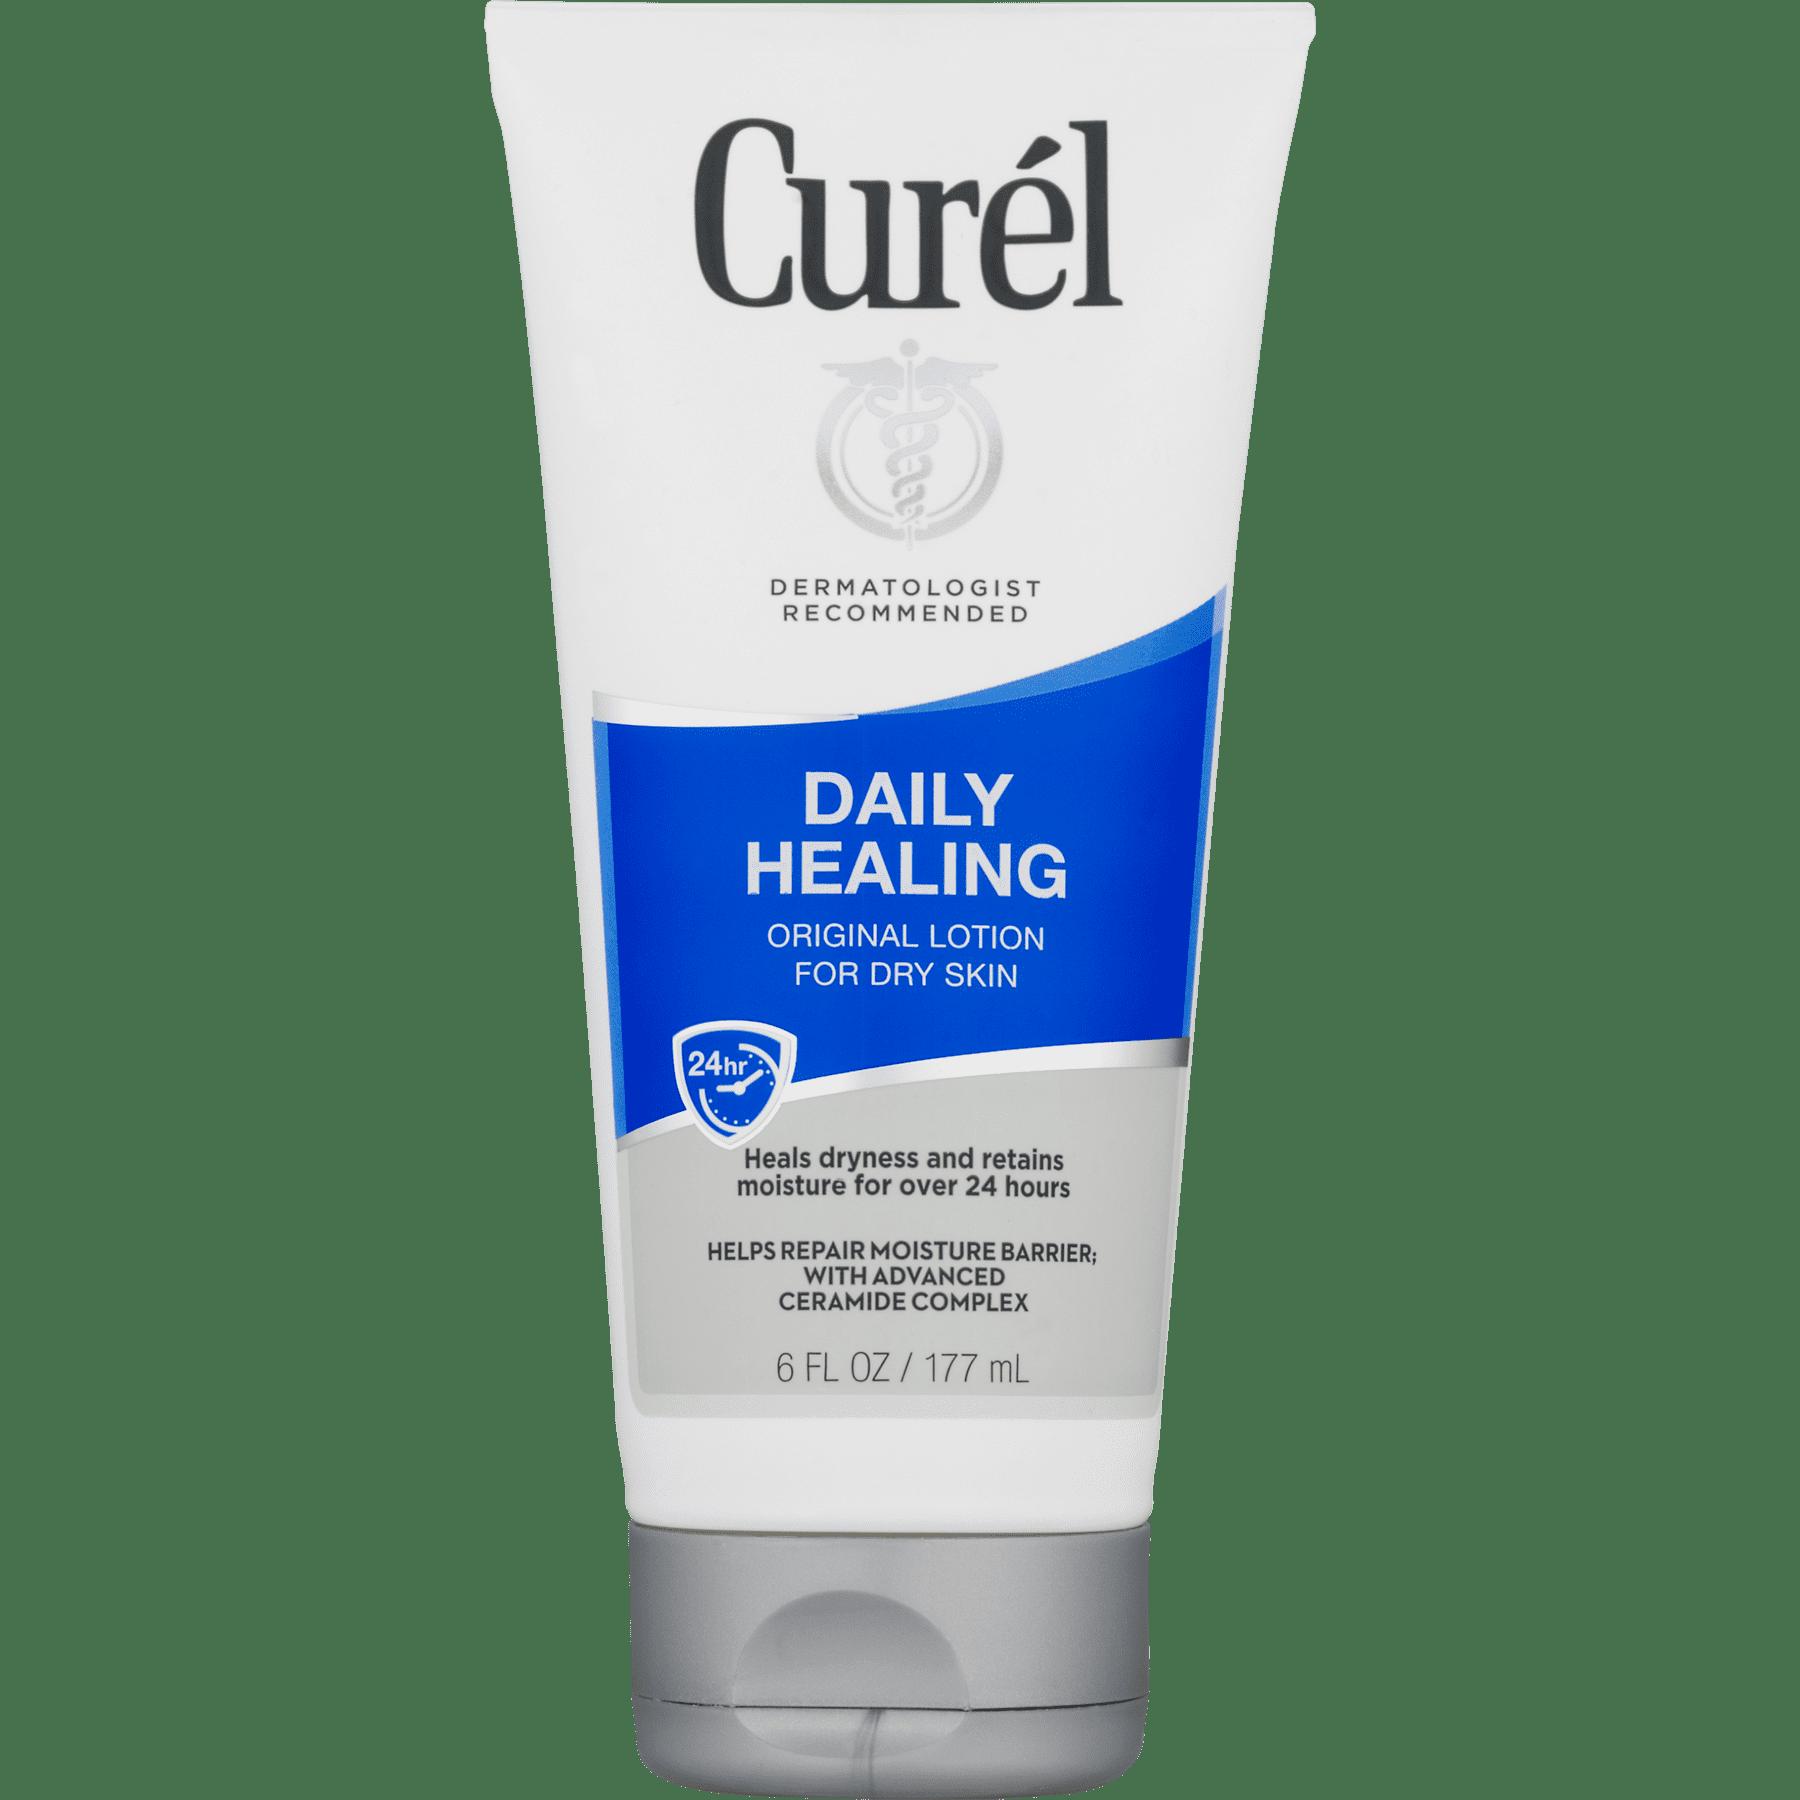 Curel Daily Moisture Lotion for Original Dry Skin 6 fl oz